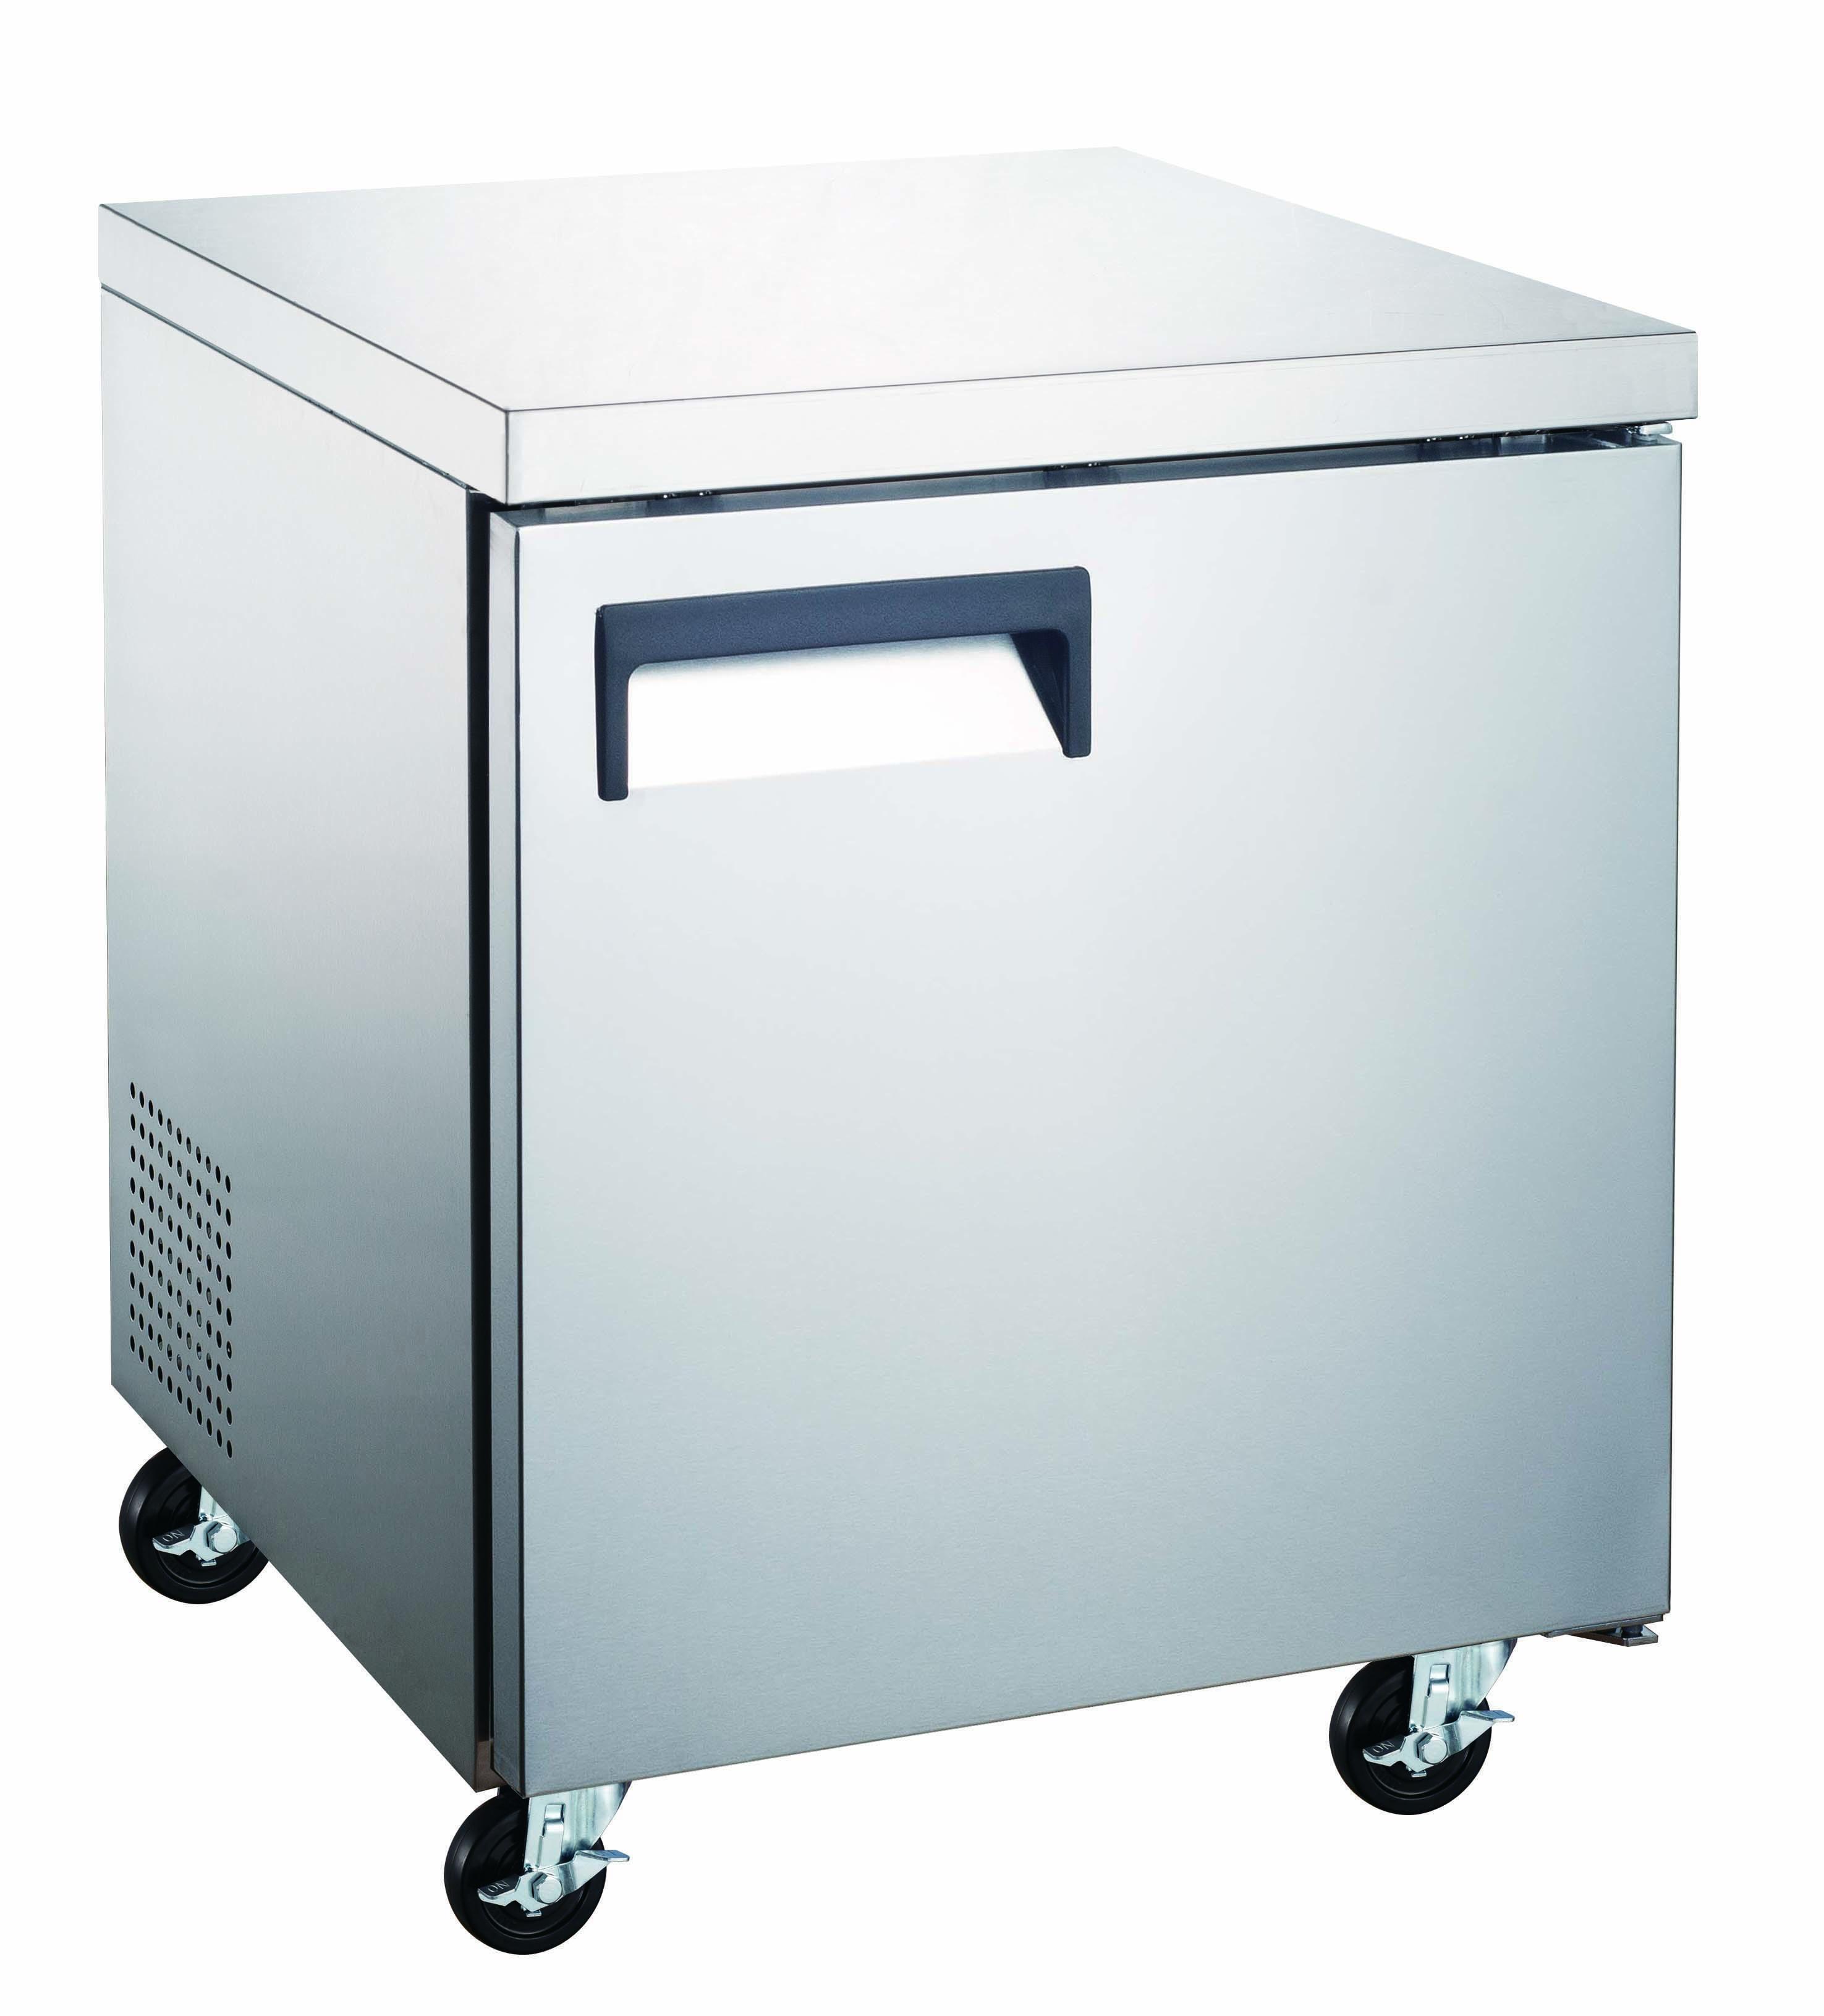 Adcraft (Admiral Craft Equipment) GRUCFZ-48 undercounter freezer